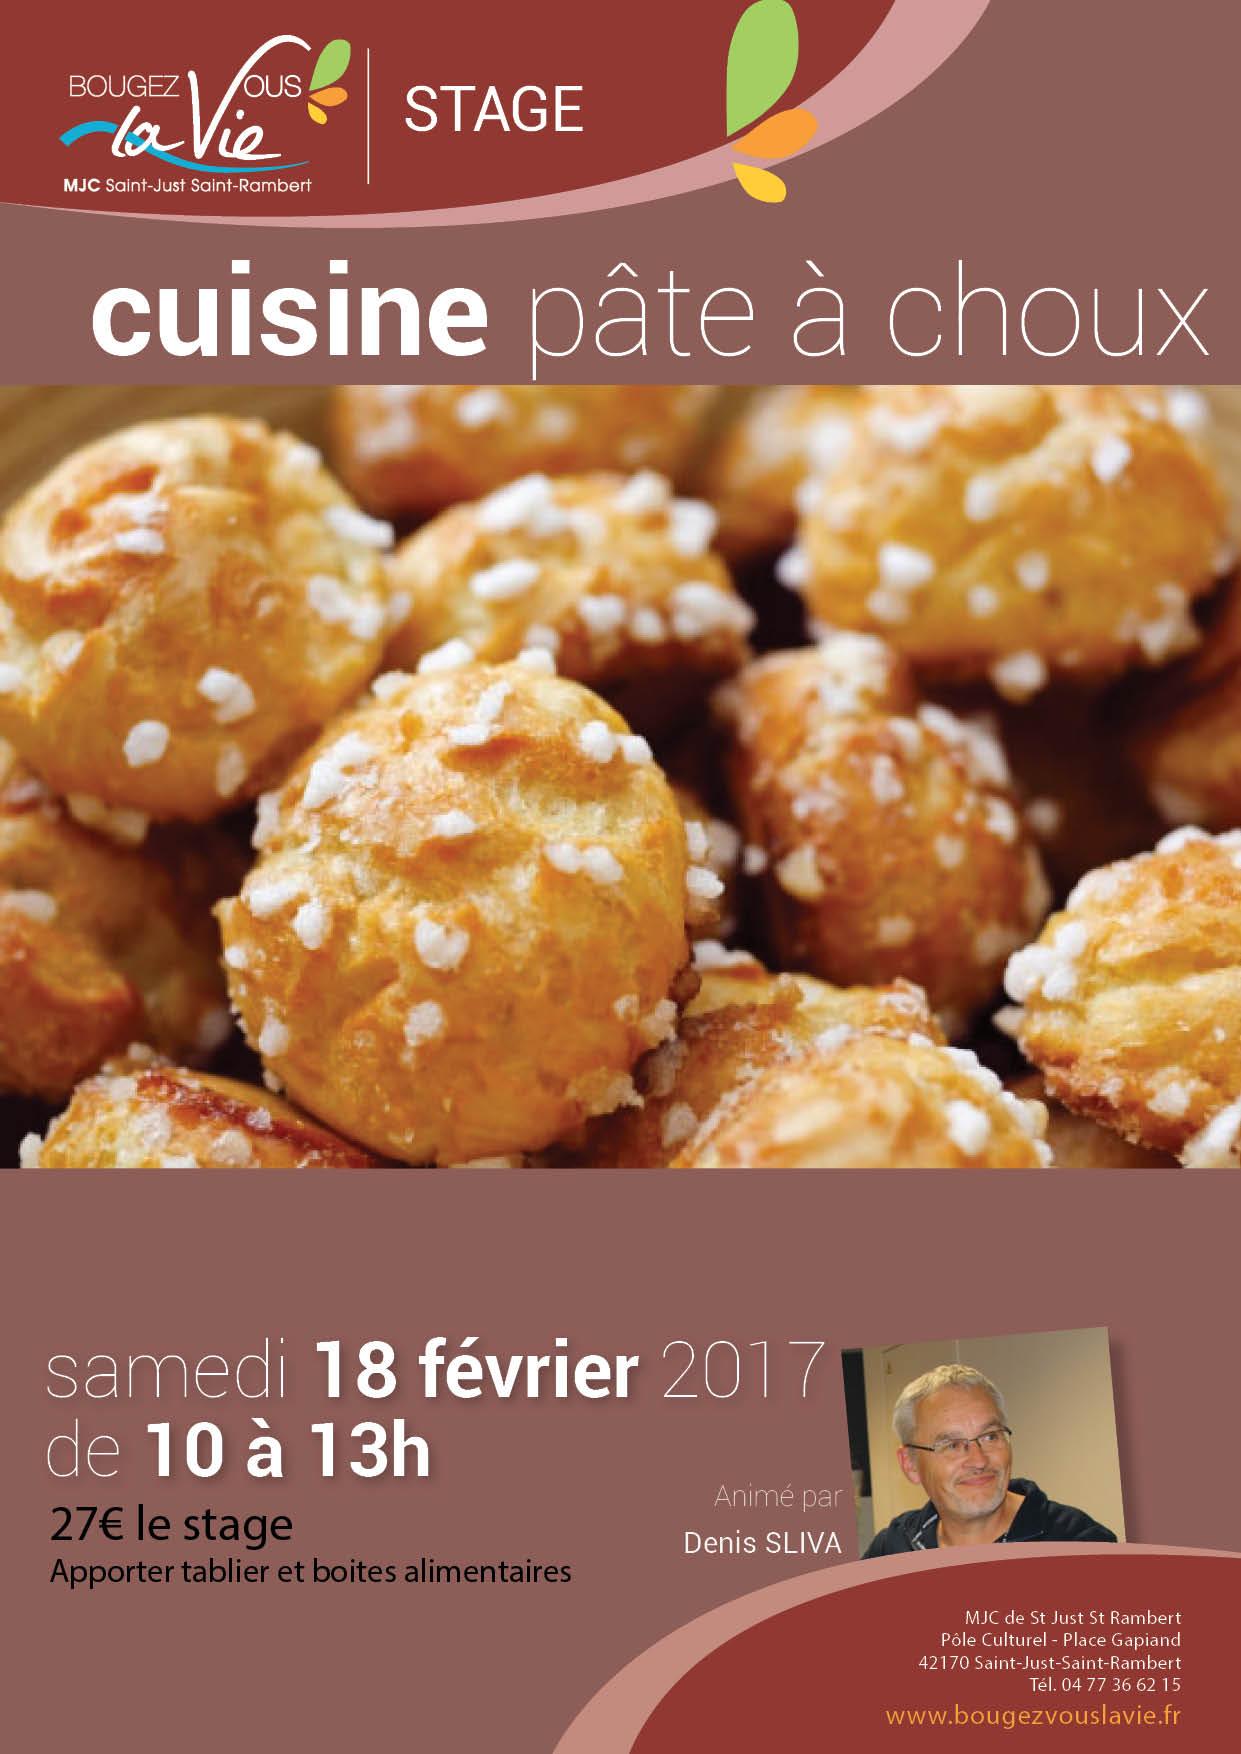 Cuisine p te choux mjc saint just saint rambertmjc - Pate a choux herve cuisine ...